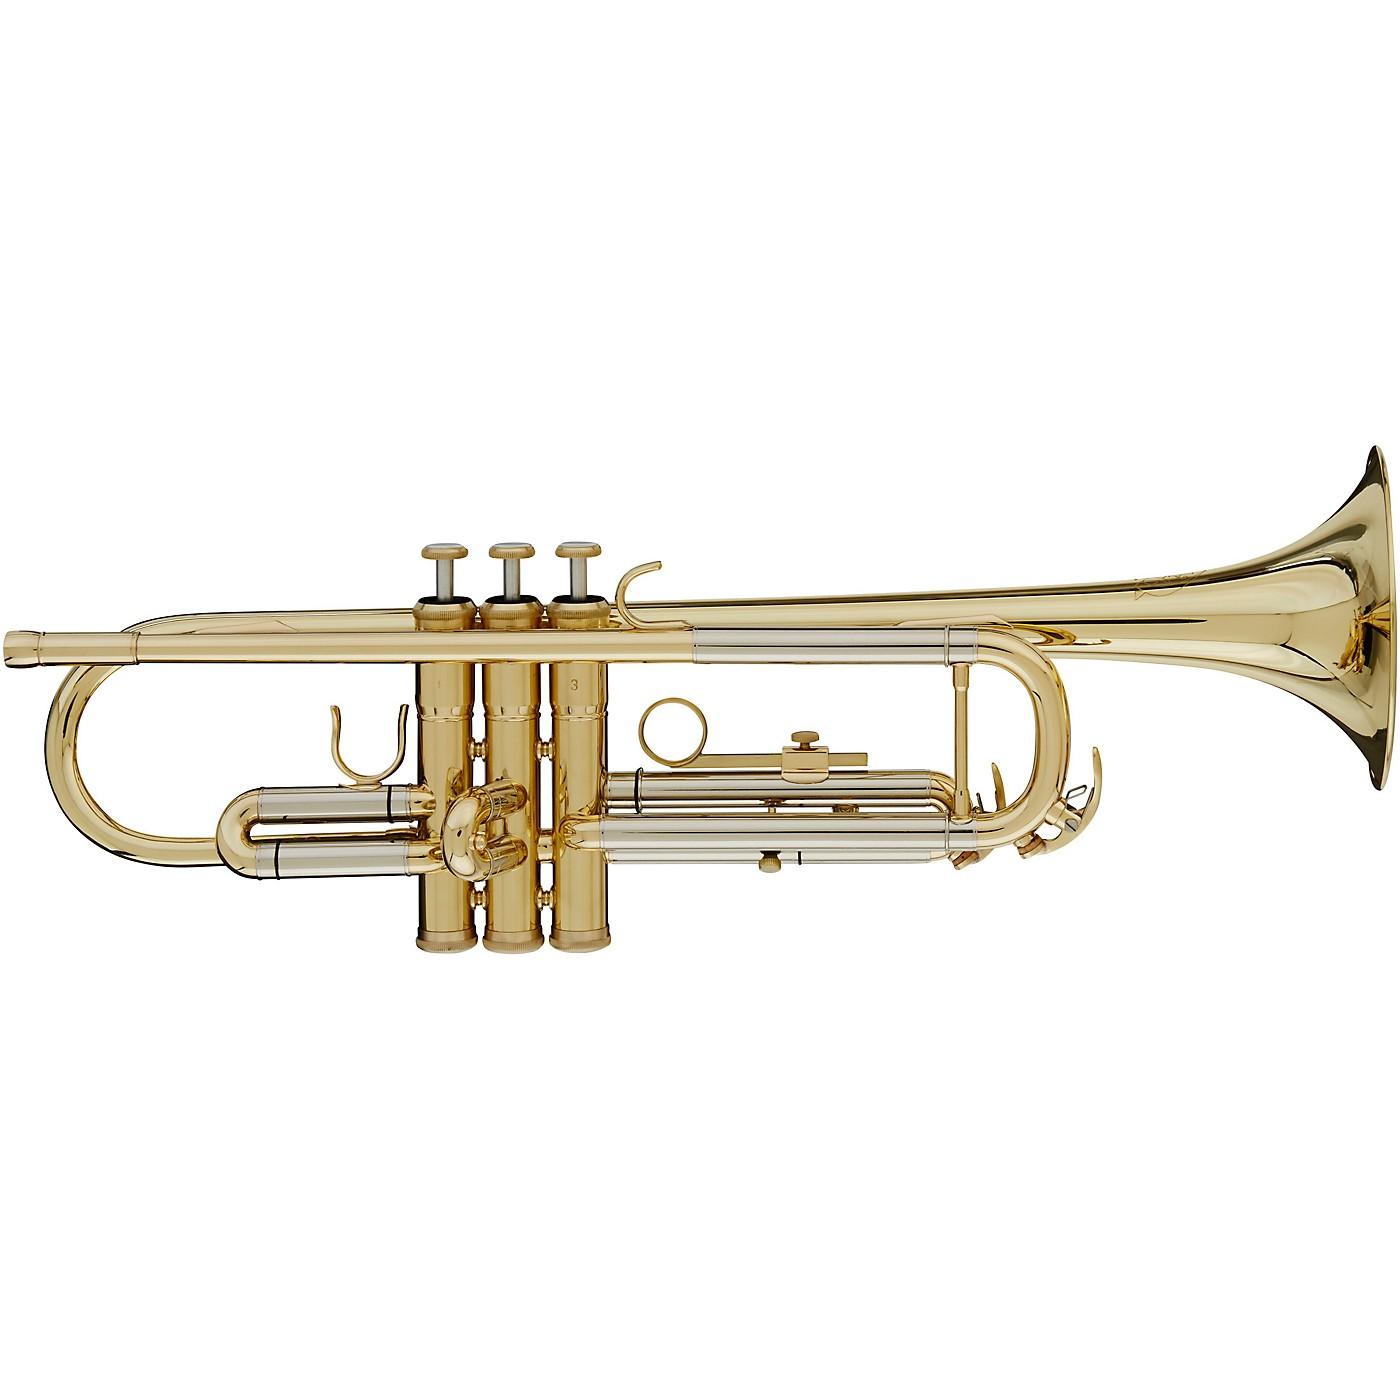 Blessing BTR-1287 Standard Series Bb Trumpet thumbnail